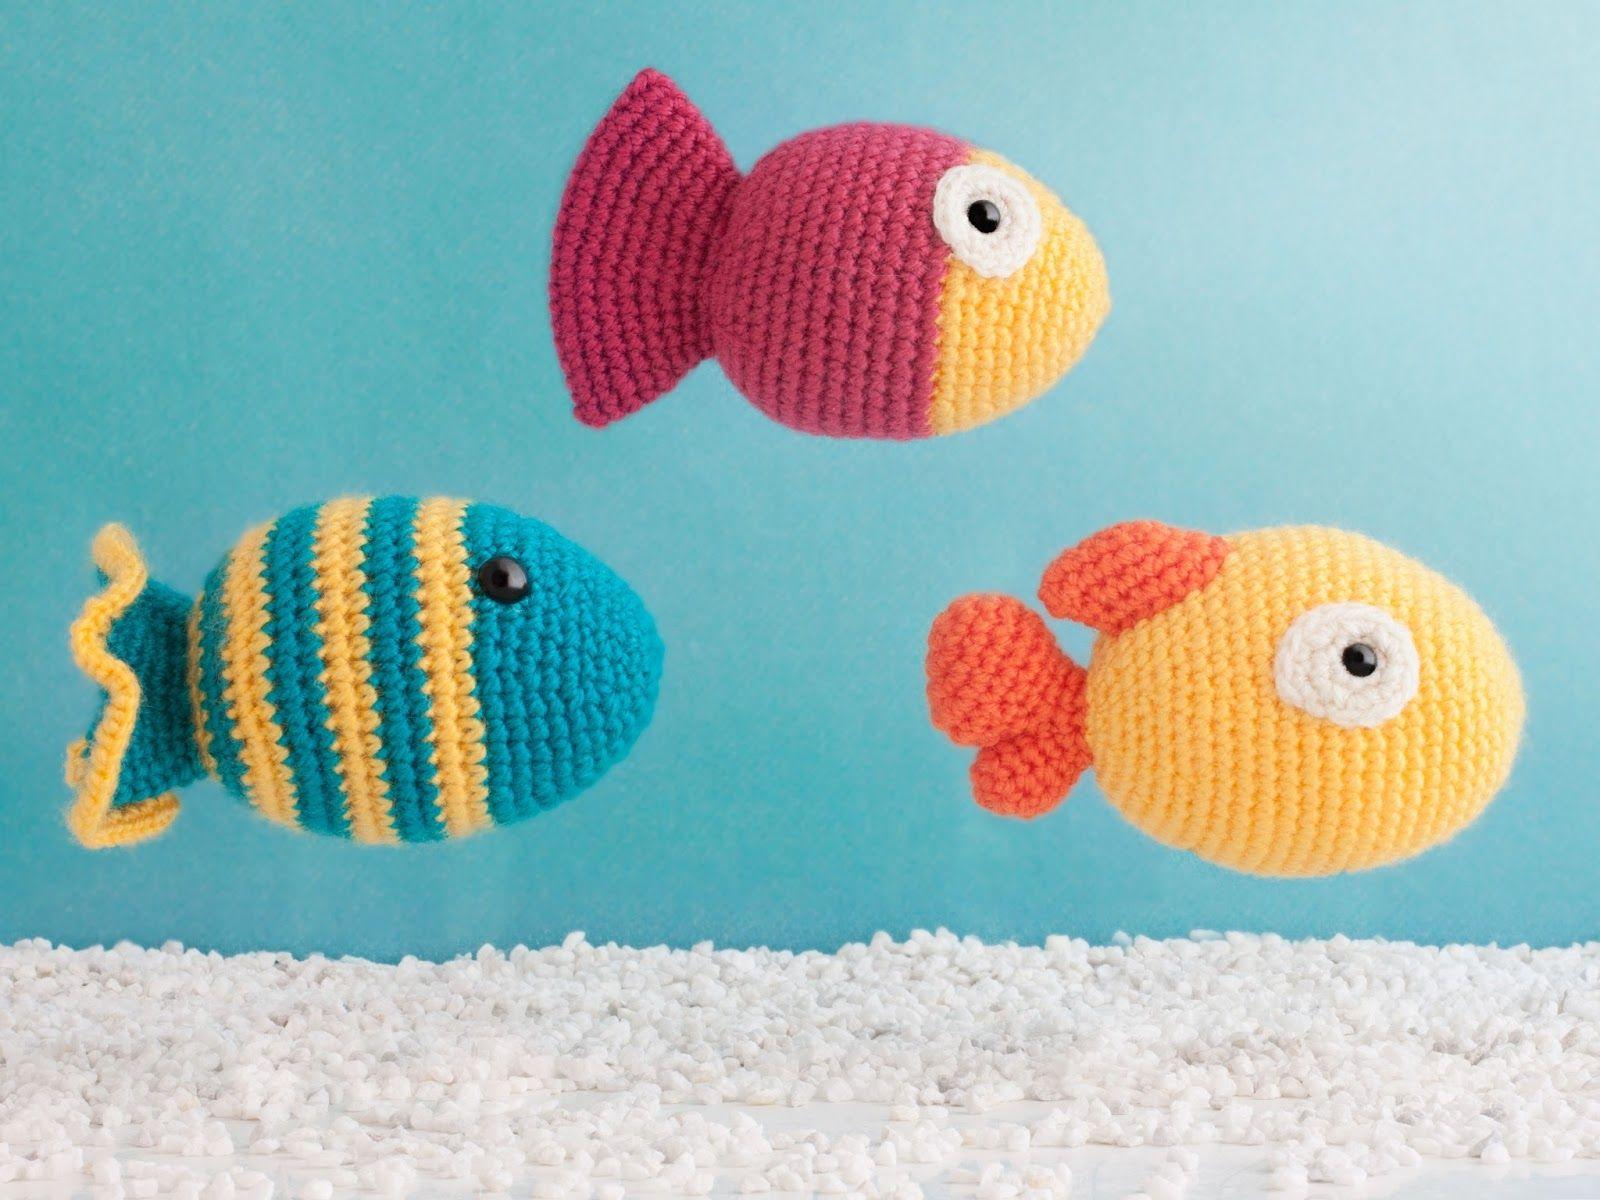 Amigurumi Fish - FREE Crochet Pattern / Tutorial here: http ...